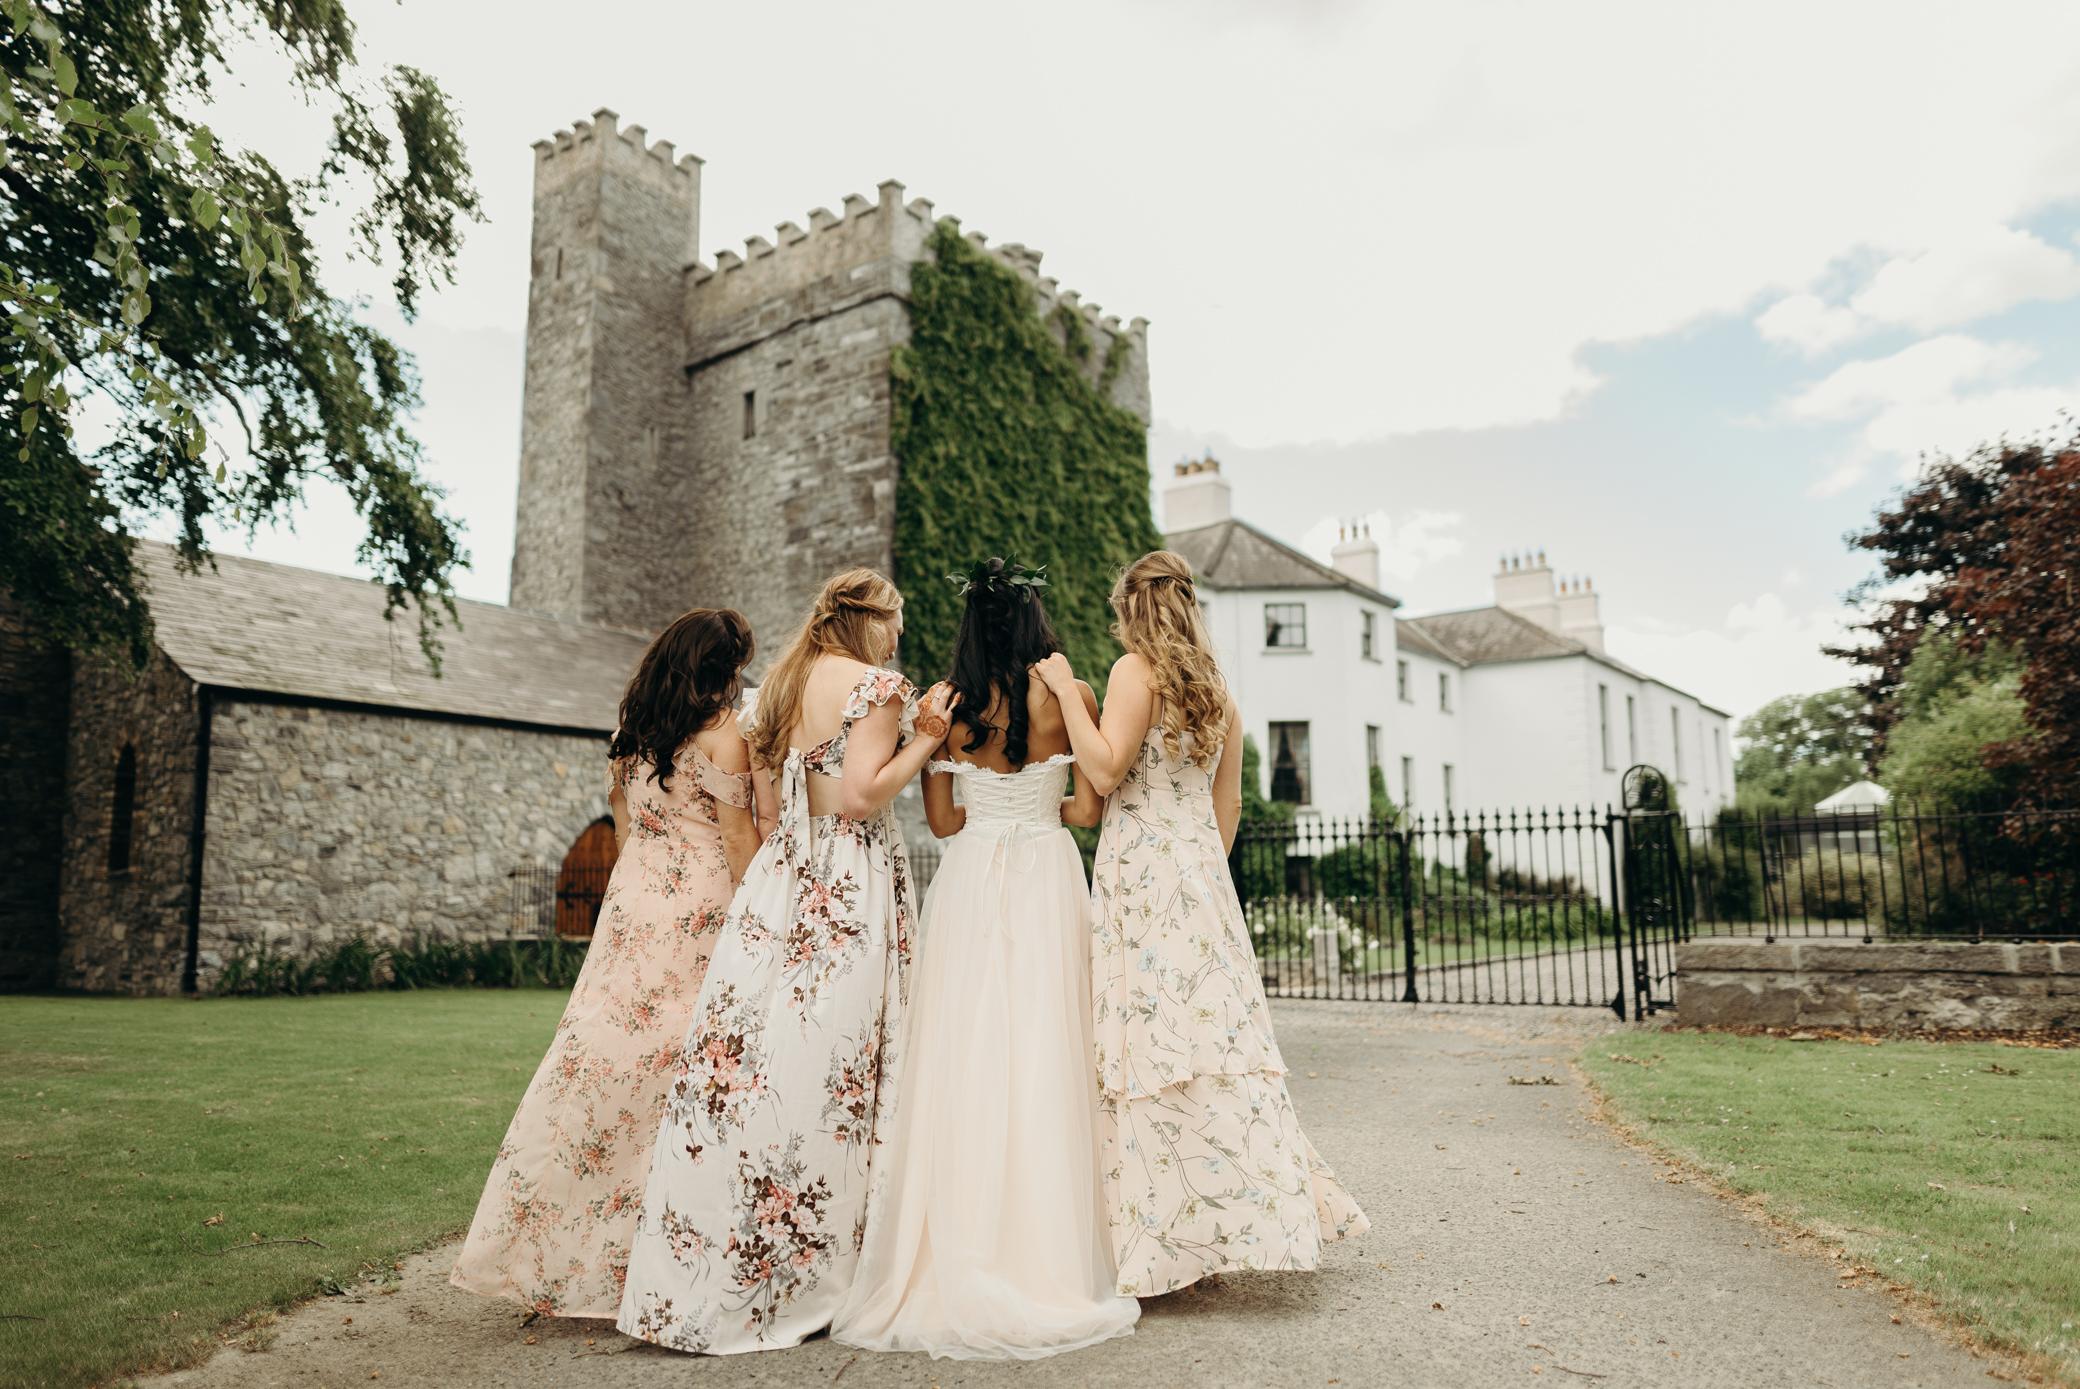 Alan&Naz- Barberstown Castle Wedding - Wedding photographer Ireland-106.jpg